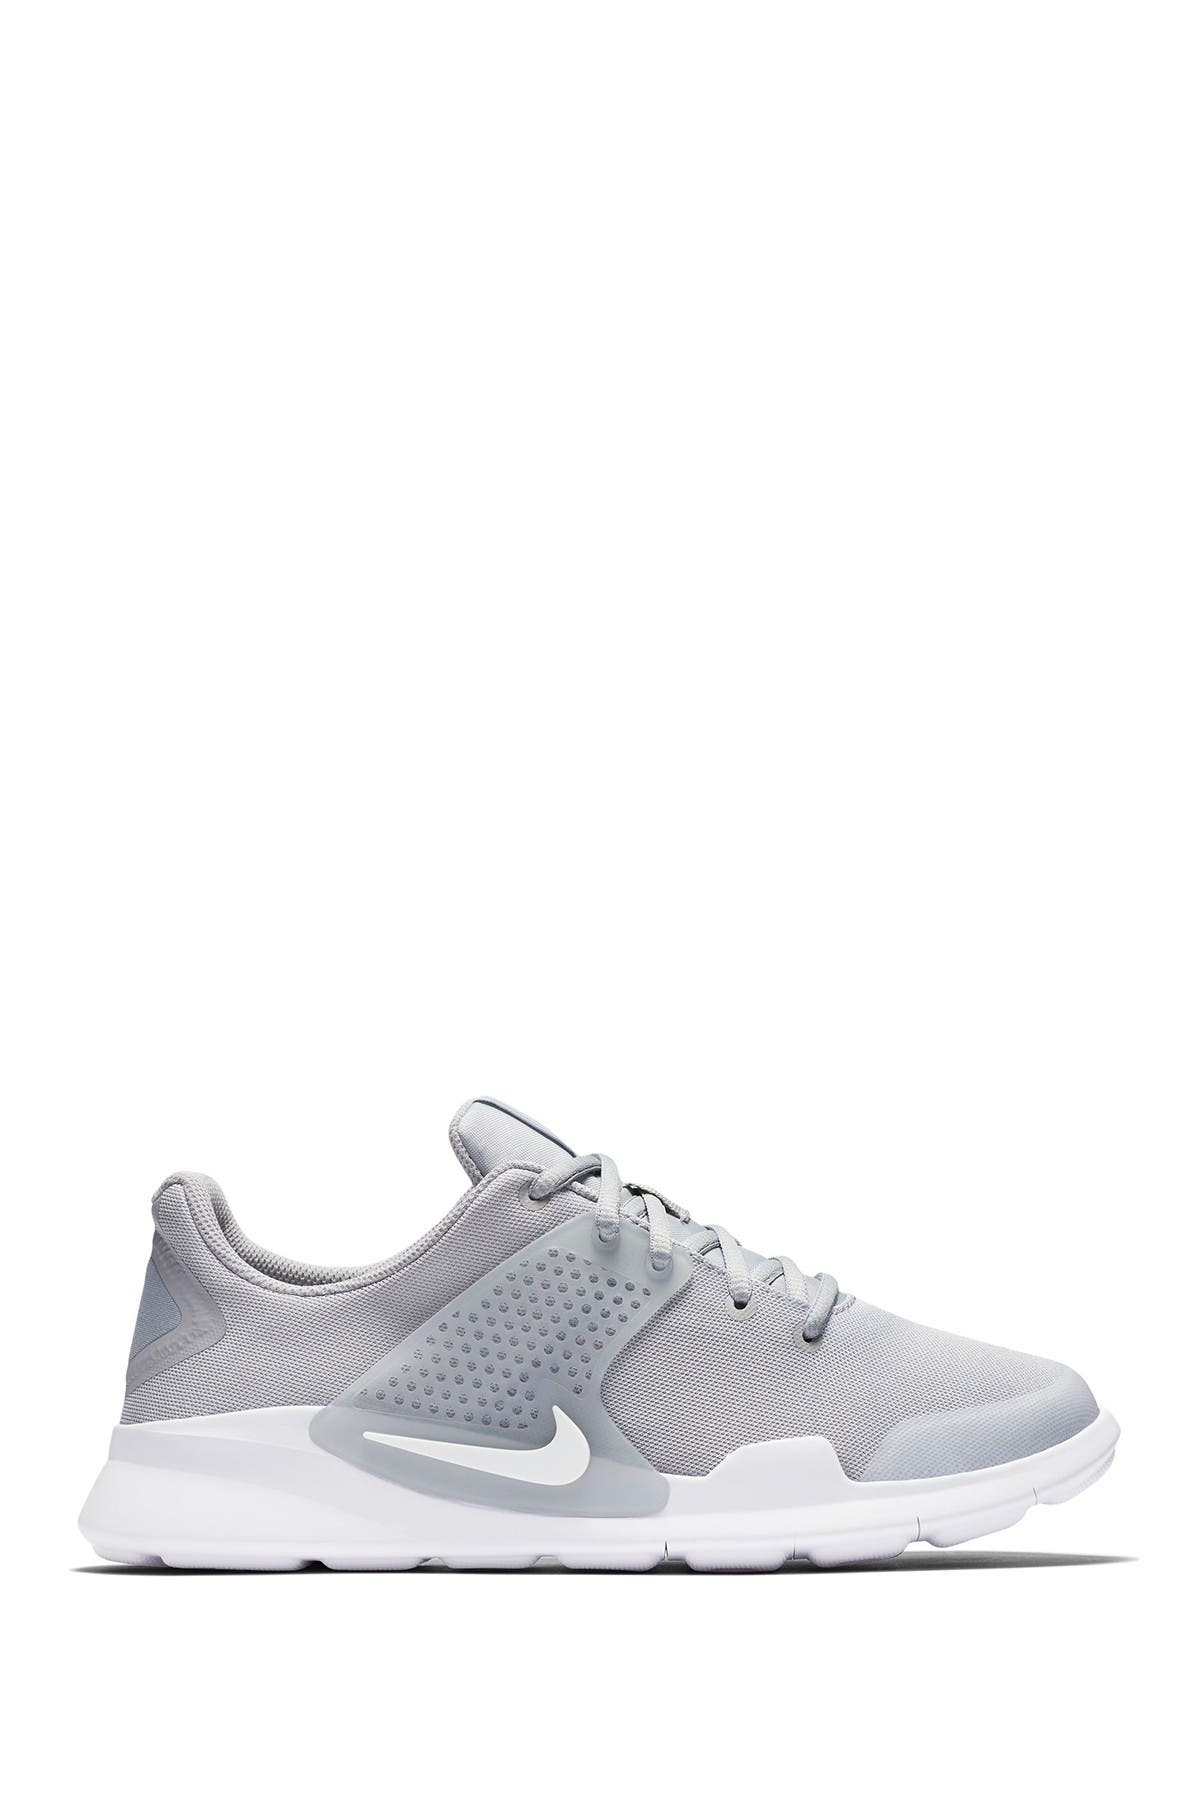 Nike | Arrowz Sneaker | Nordstrom Rack